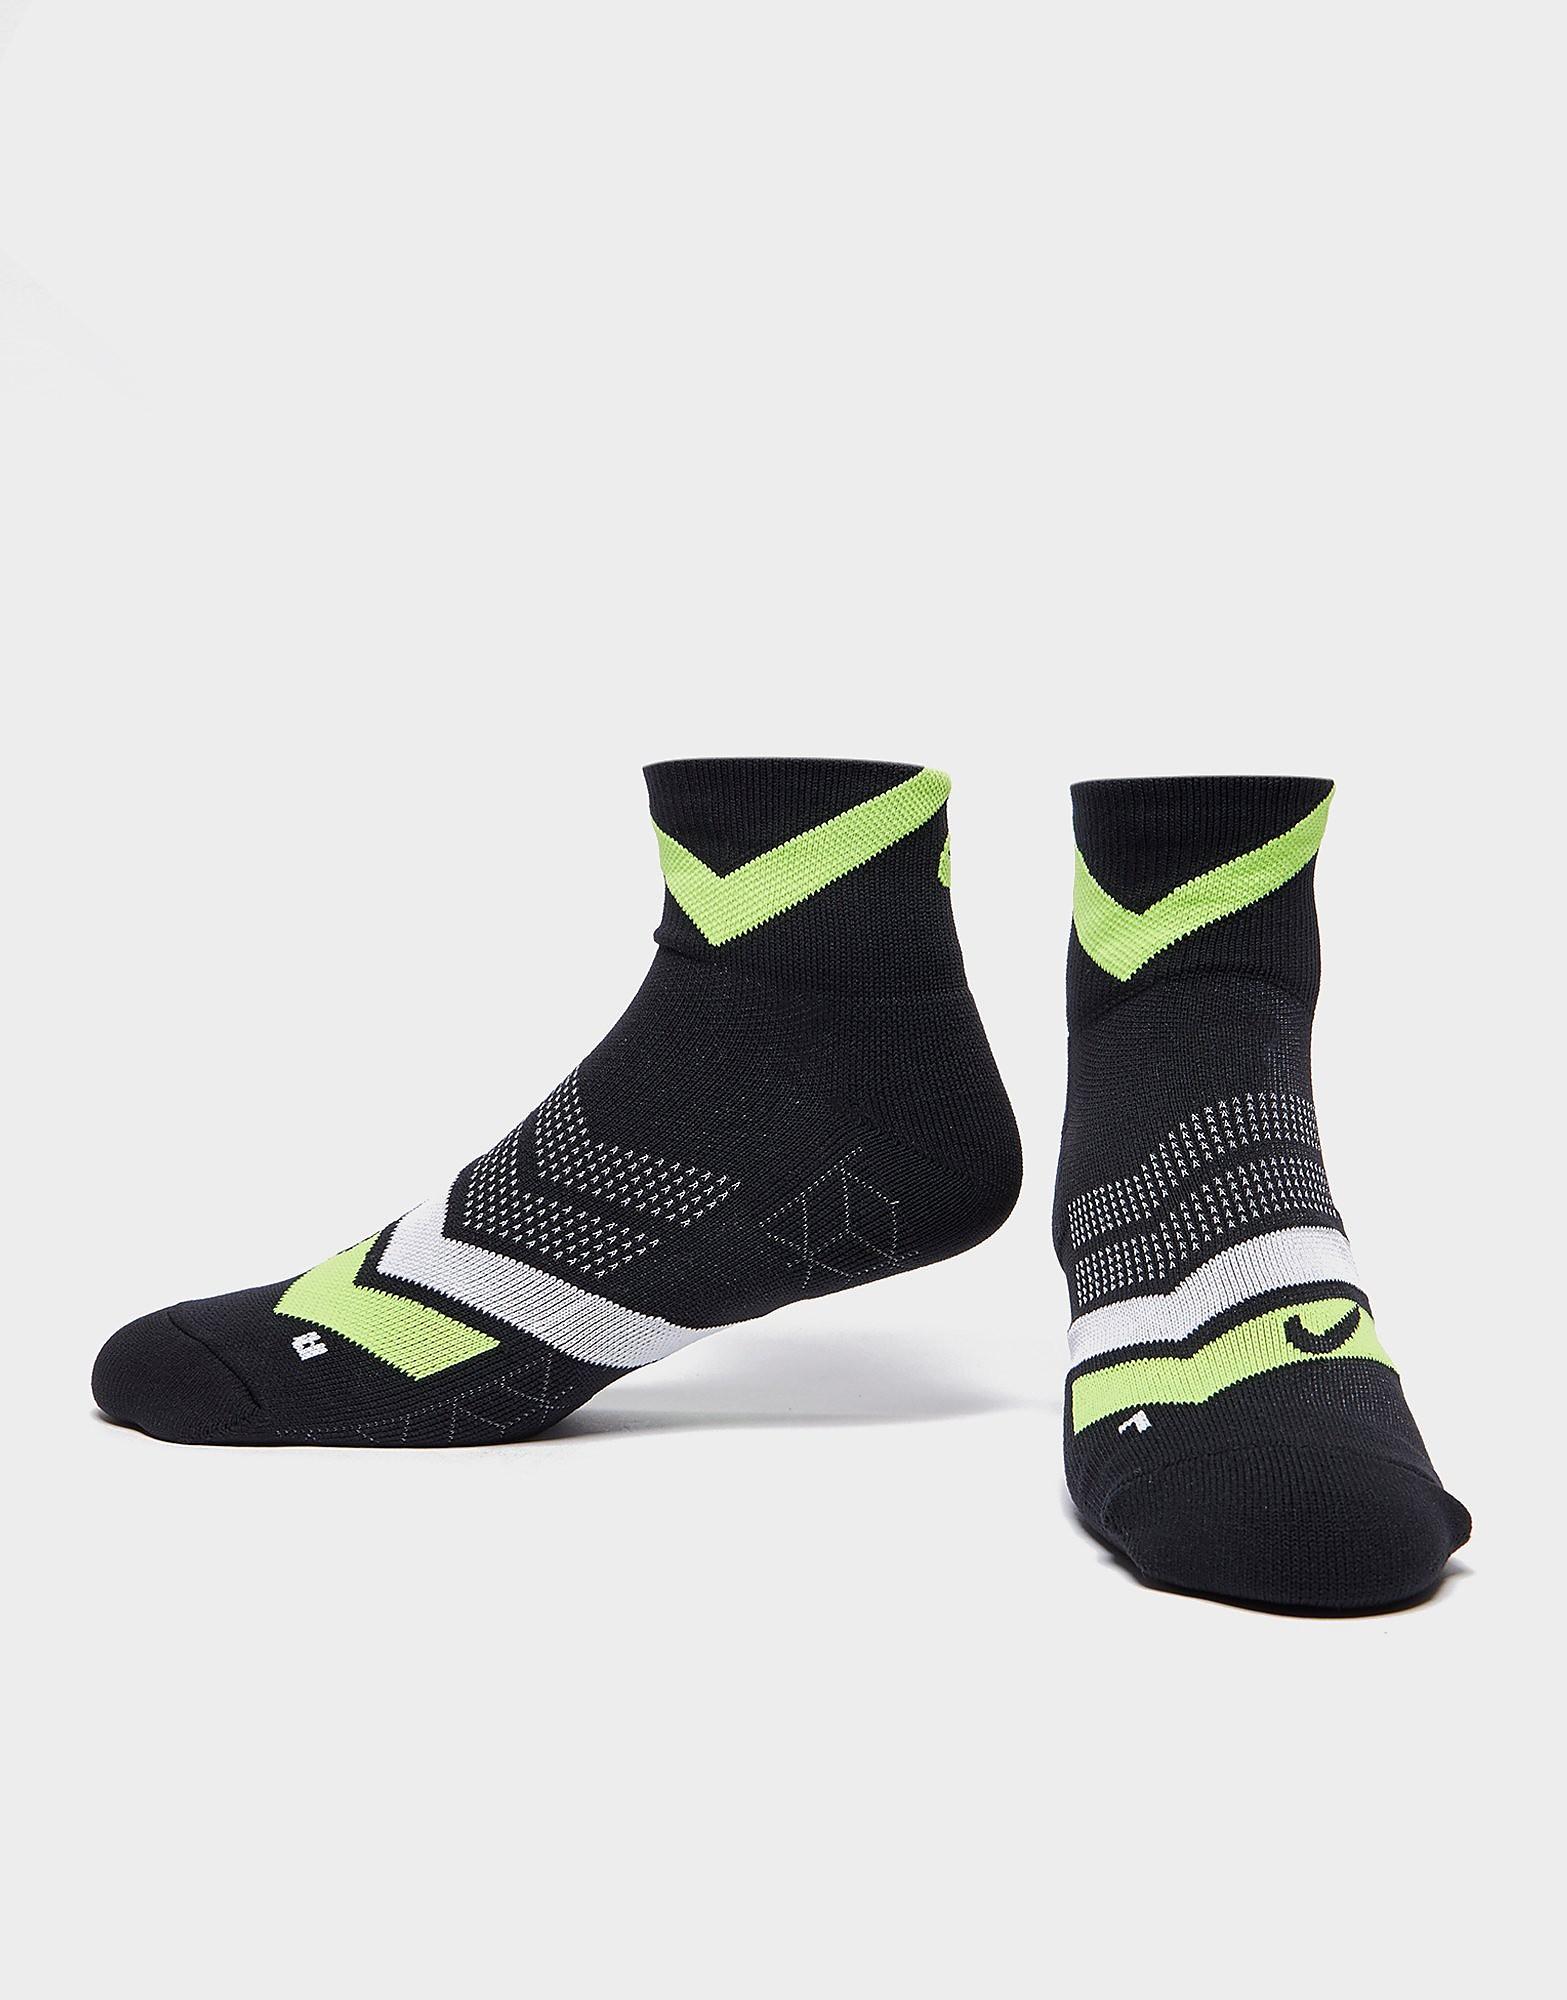 Nike Running Dri-FIT Cushioned Socks